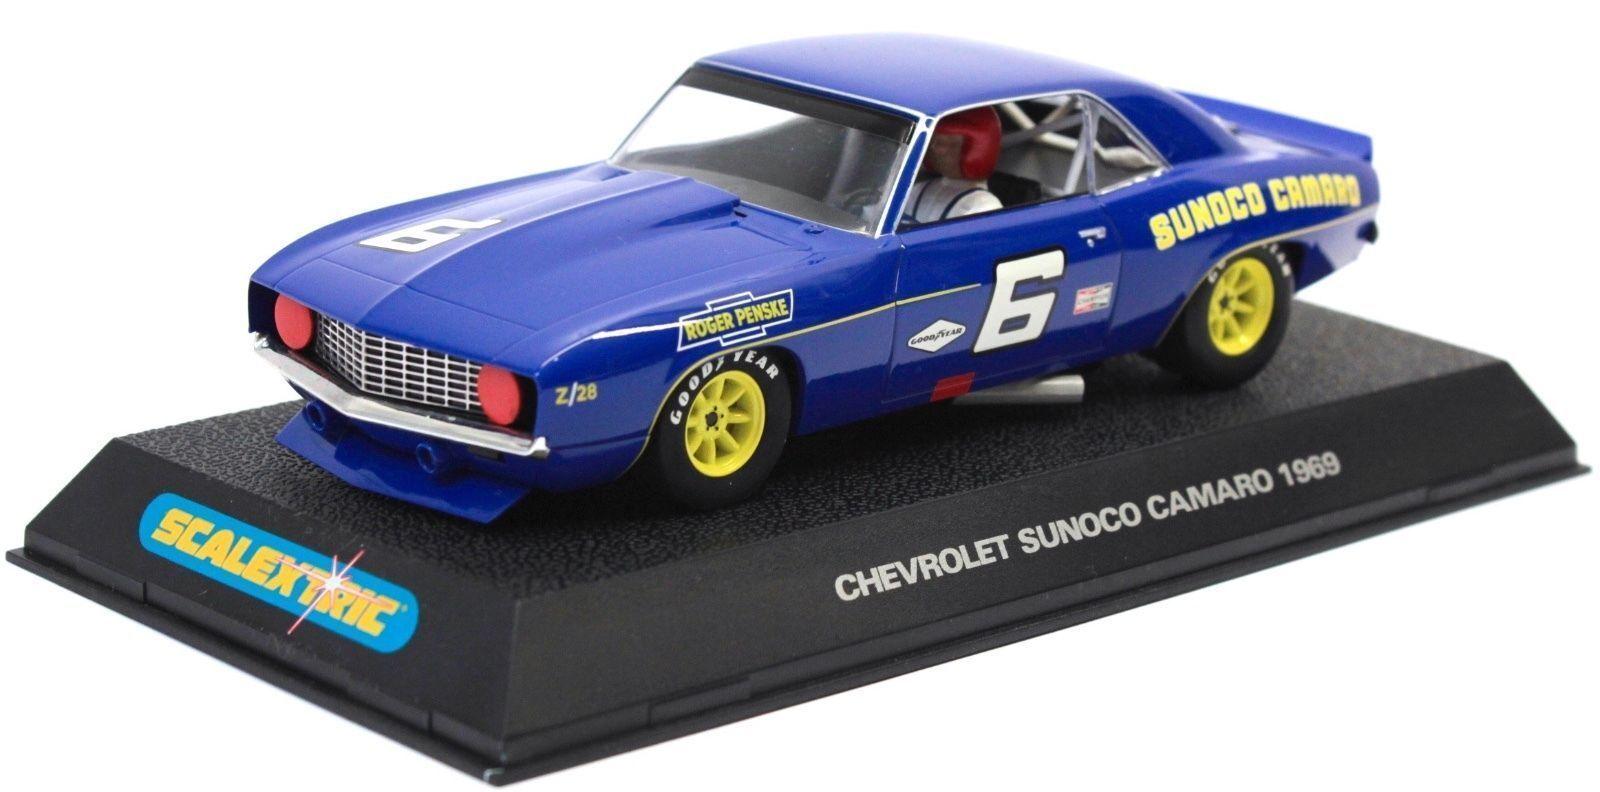 Scalextric - C2399 Chevrolet Camaro 1969 N°6 - NEW